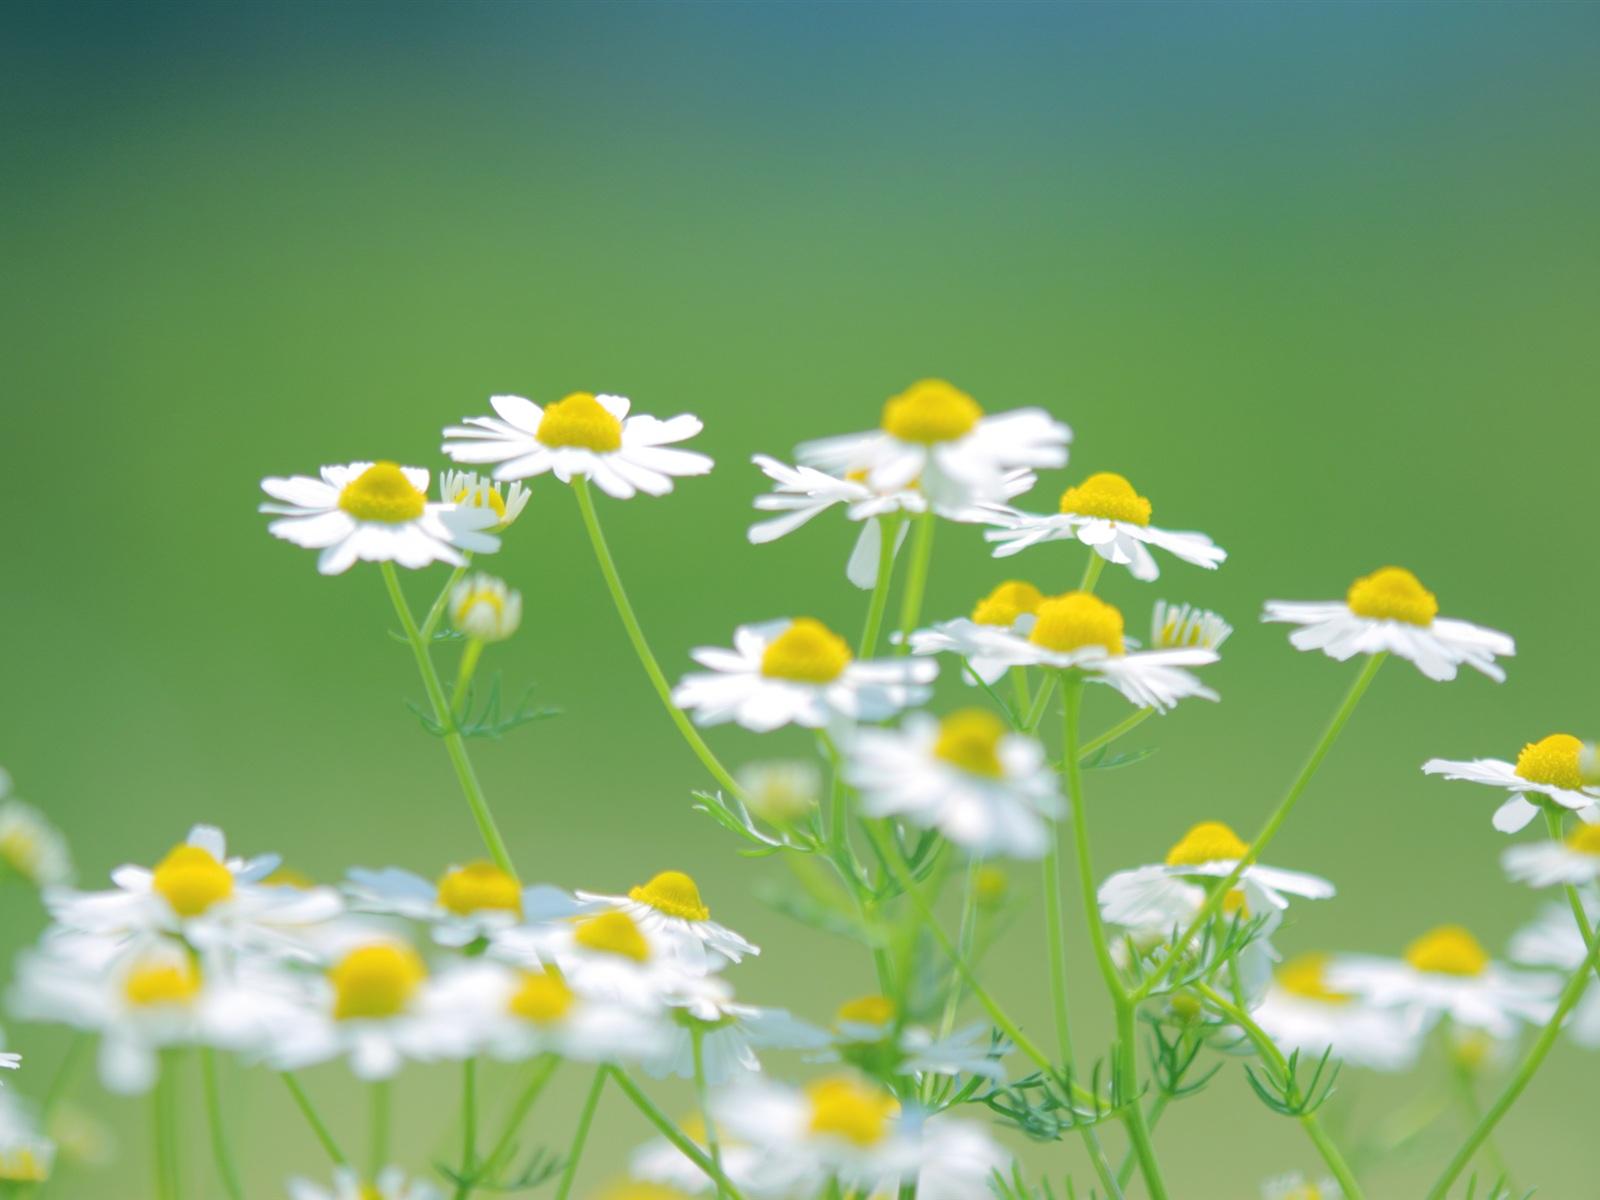 fleurs marguerites blanches t nature fond vert fonds d 39 cran 1600x1200 fonds d 39 cran de. Black Bedroom Furniture Sets. Home Design Ideas